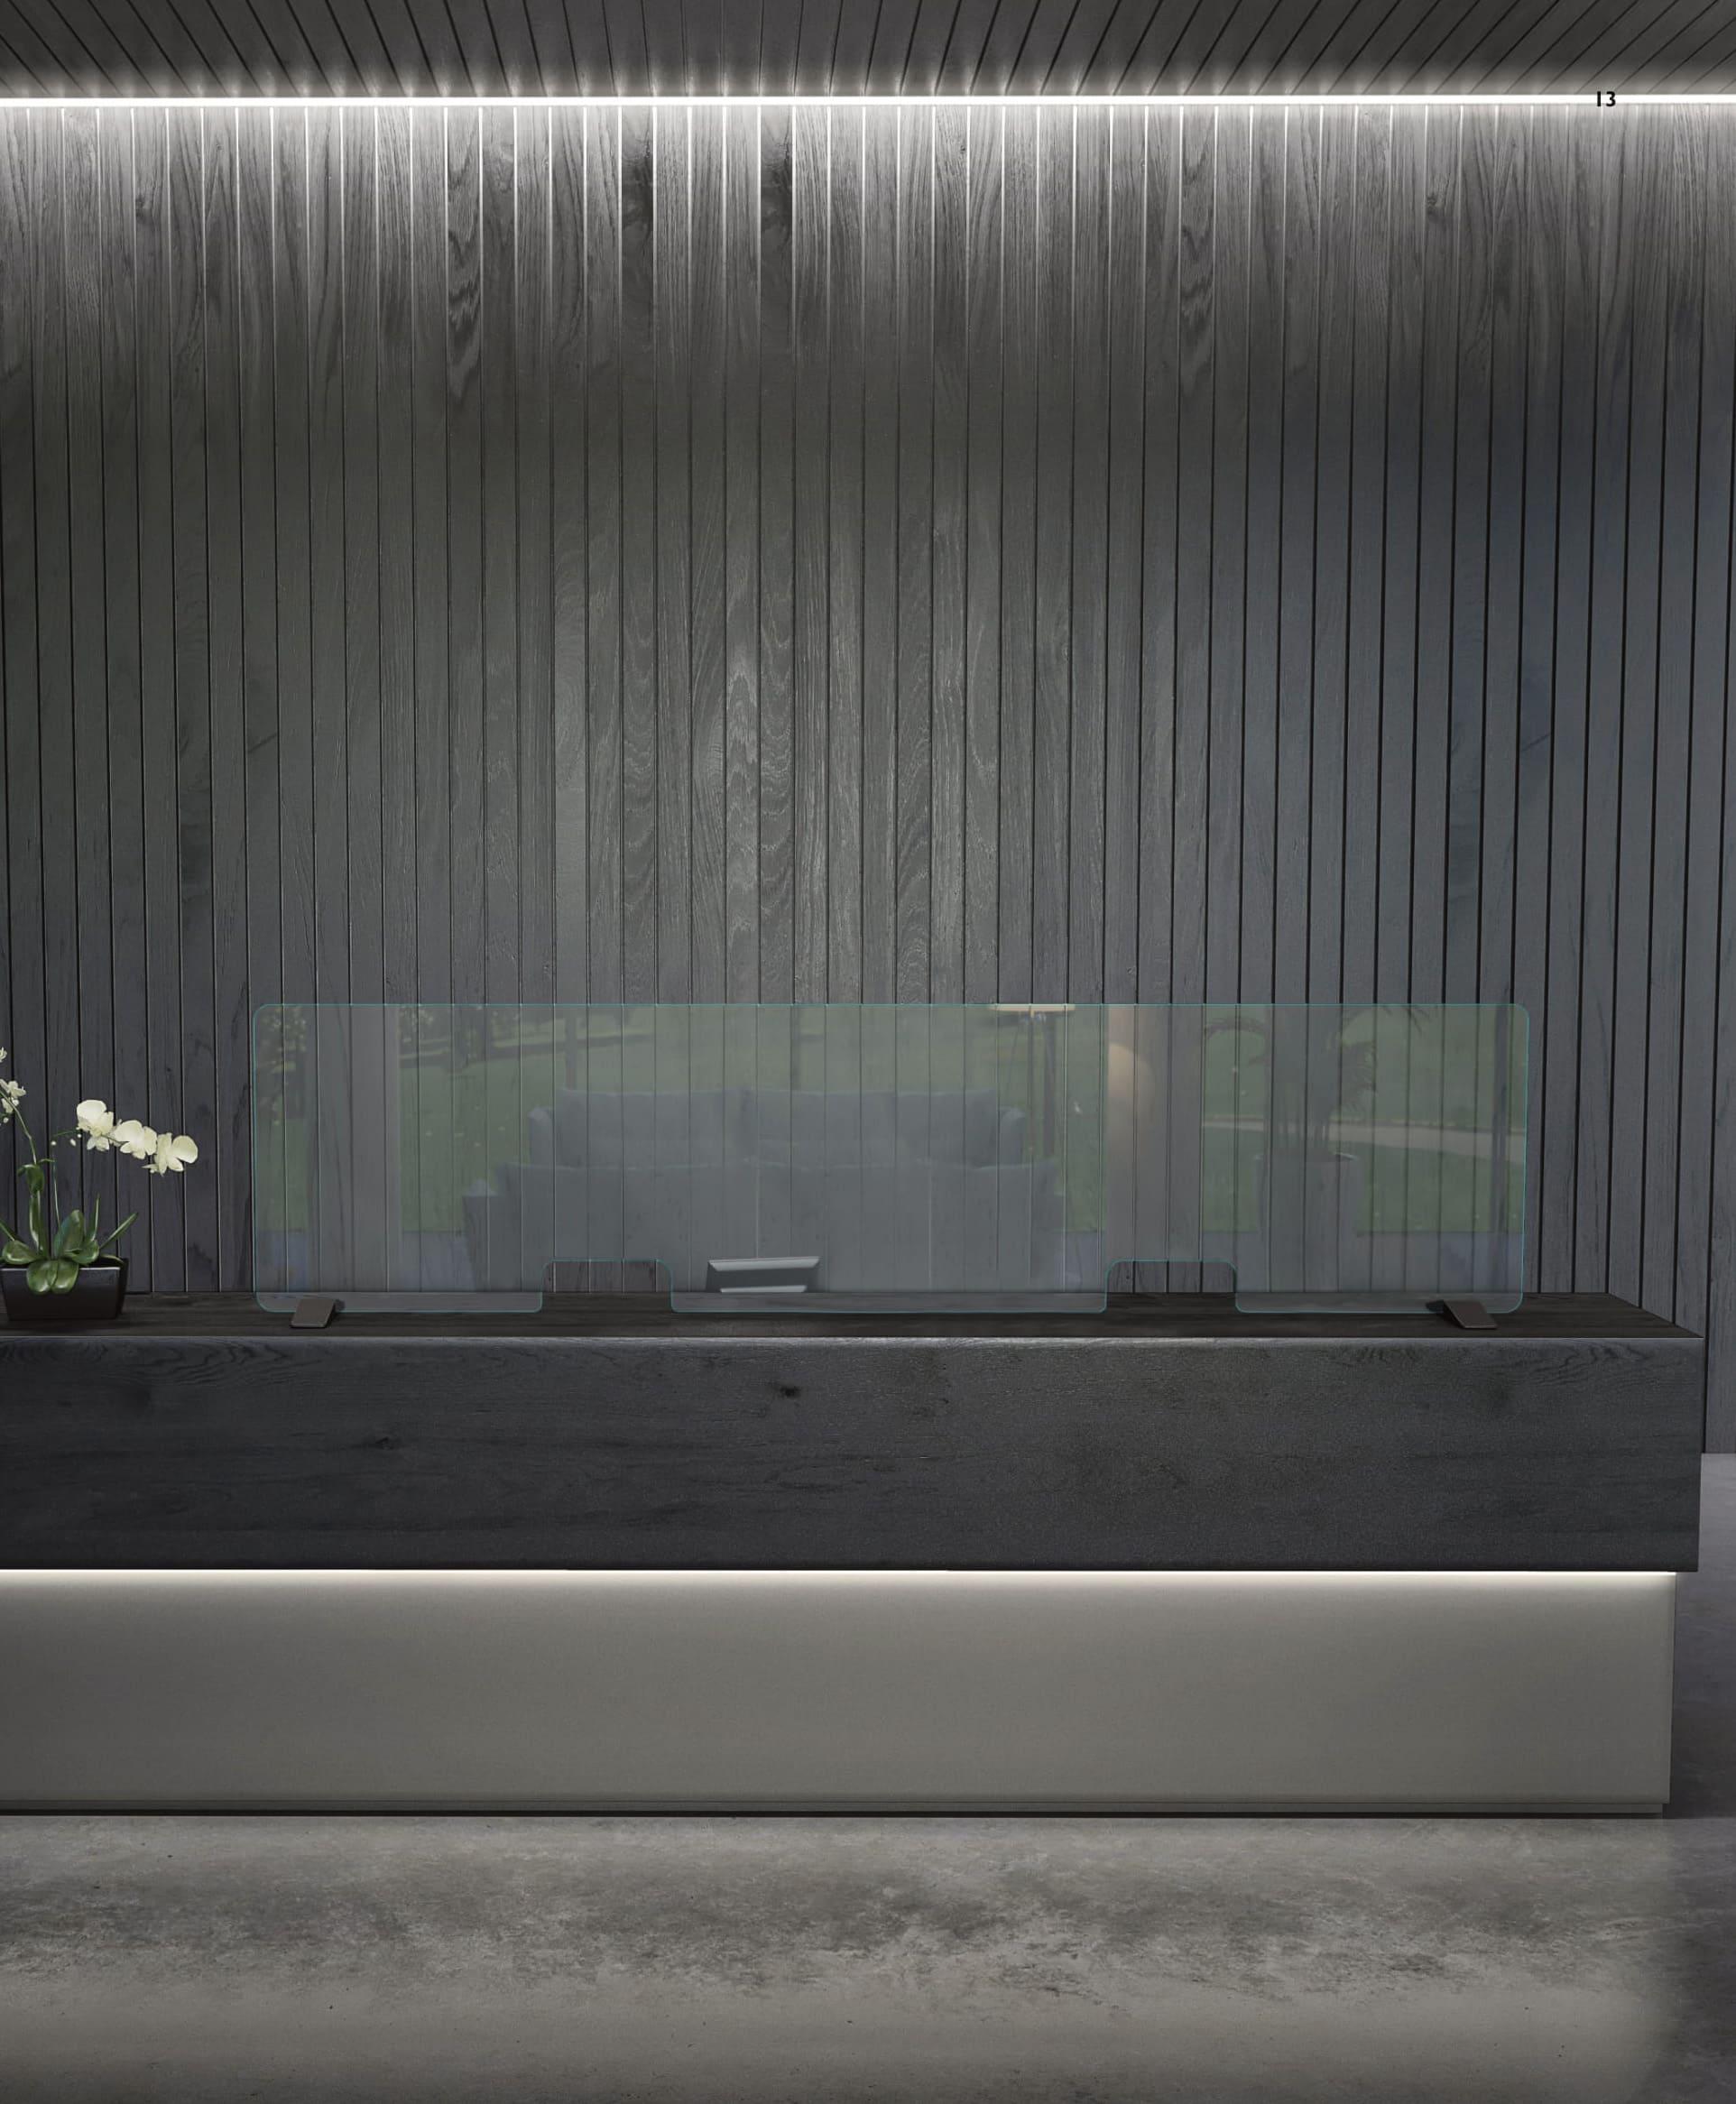 Trennwand aus Glas Gras Italia Design Glastrennwand